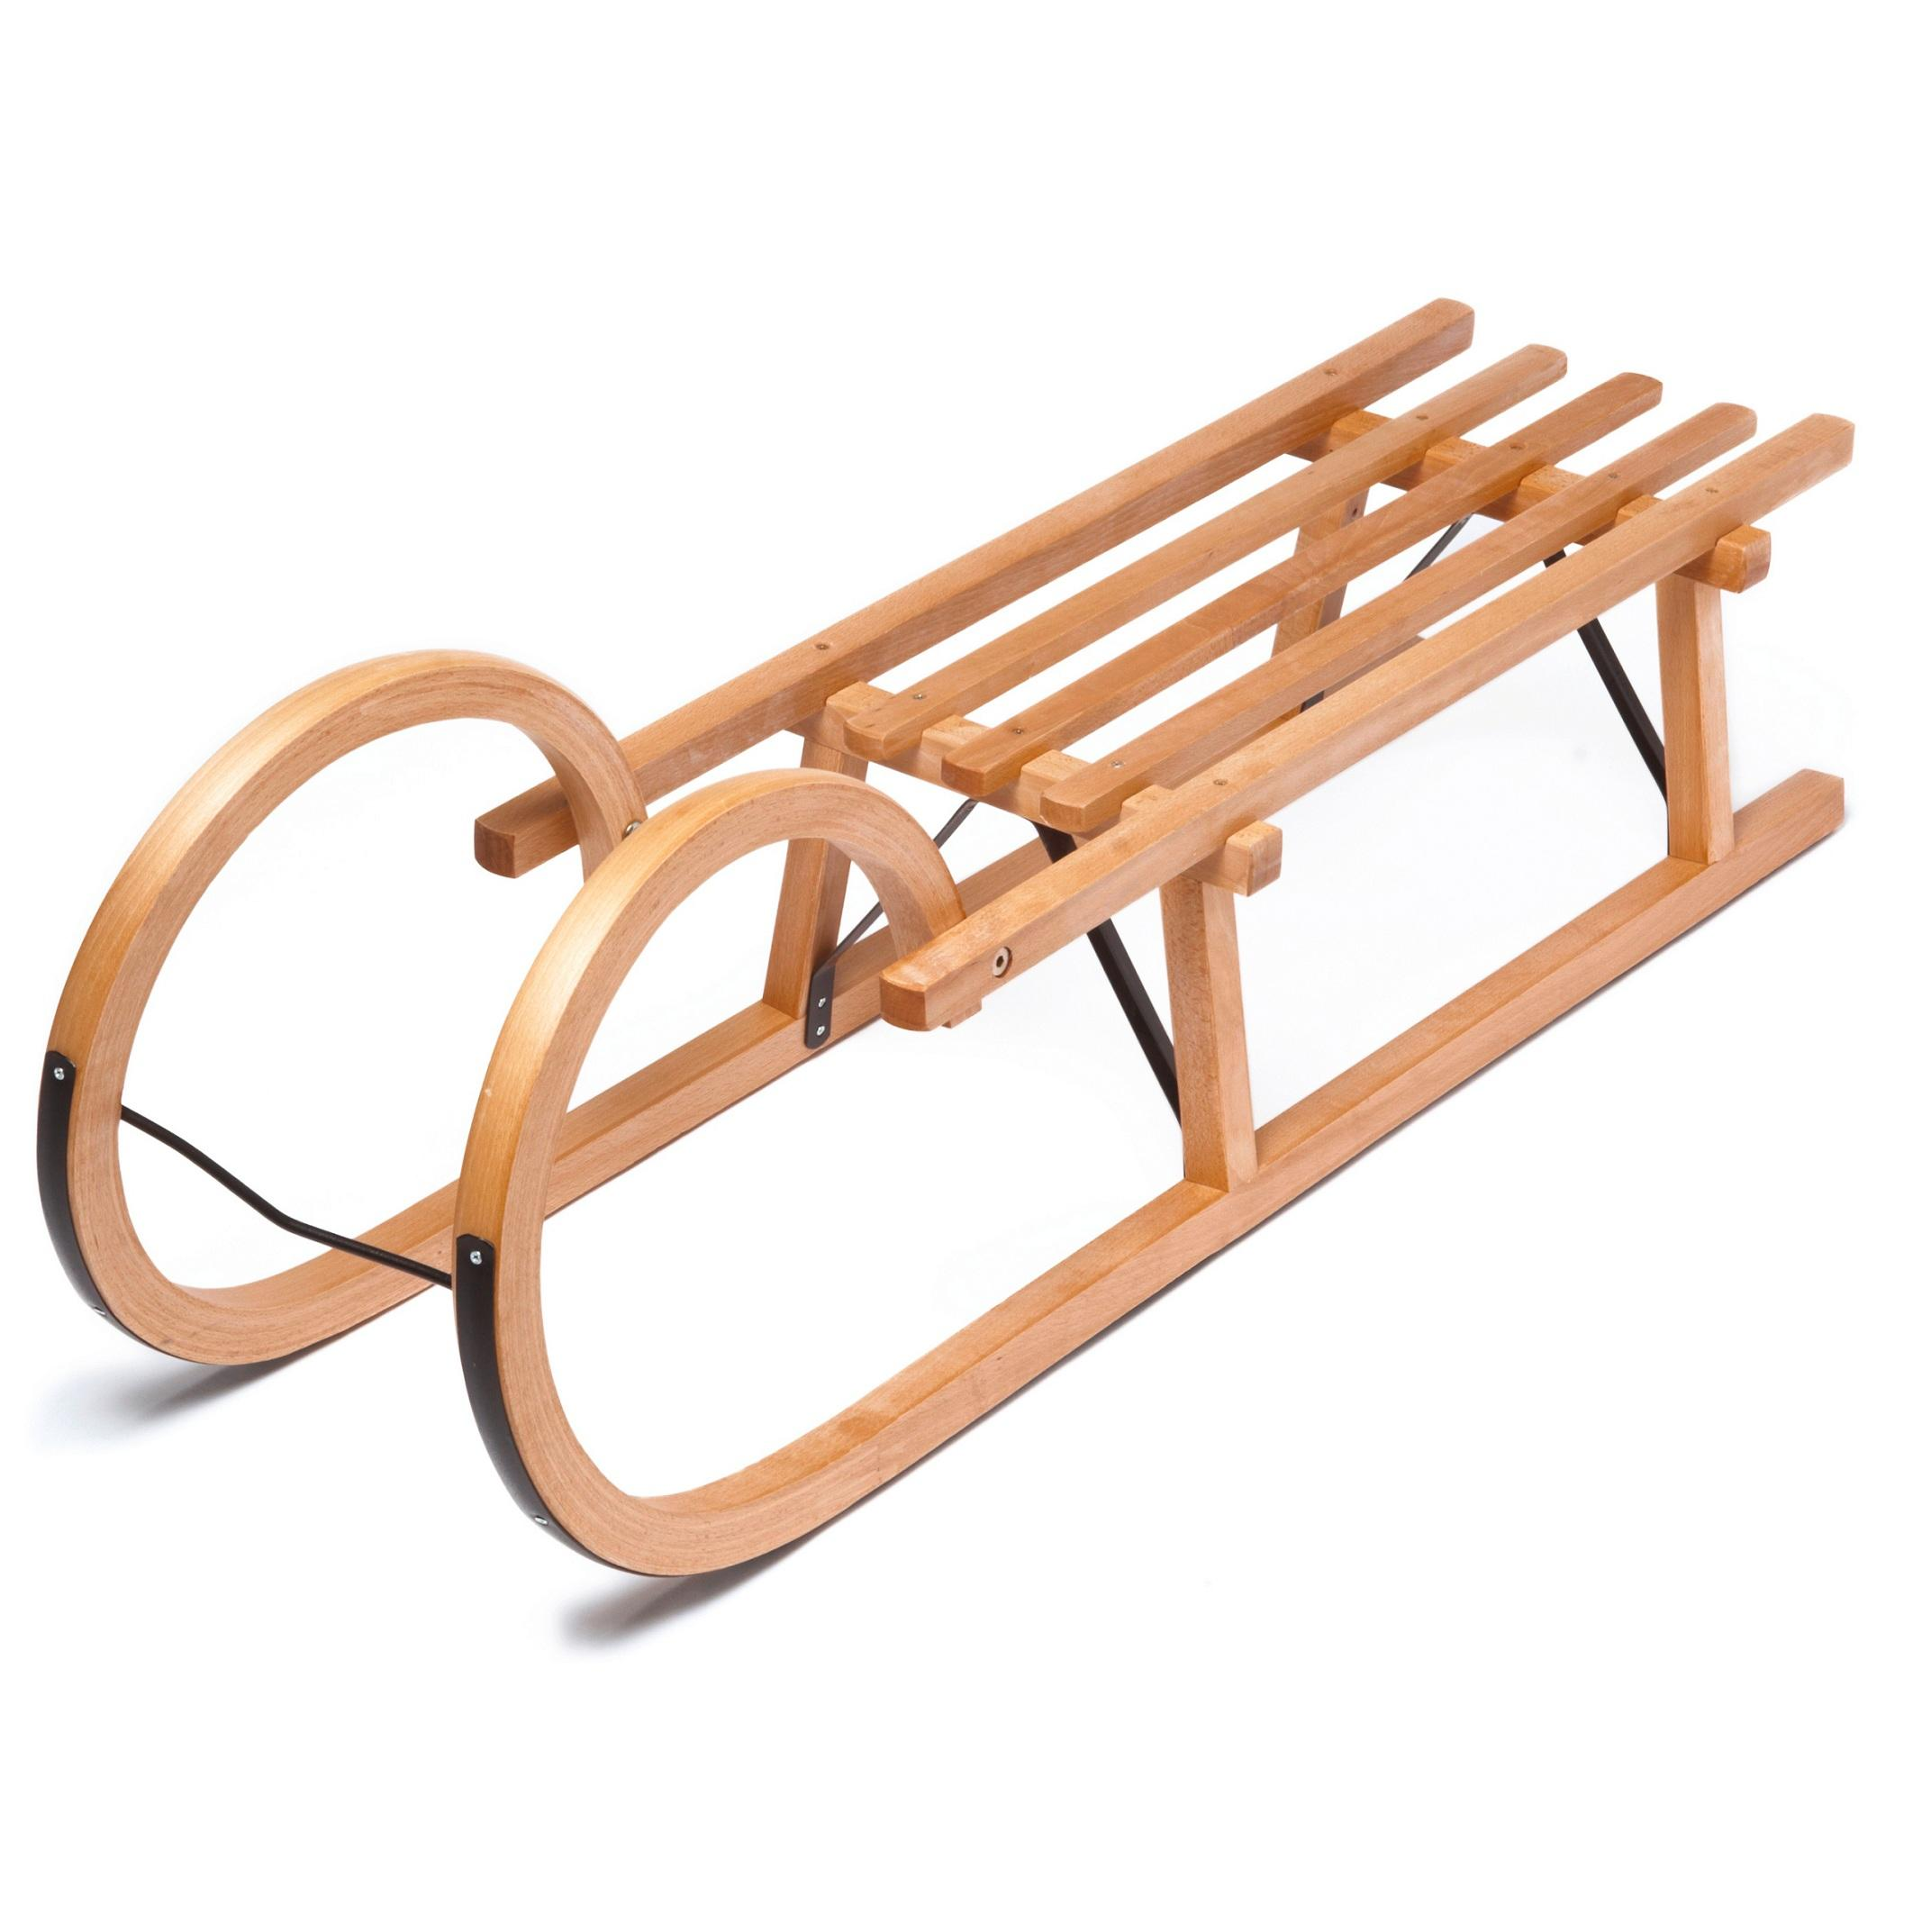 ultrasport horn toboggan 43 inches 110 cm sports outdoors. Black Bedroom Furniture Sets. Home Design Ideas